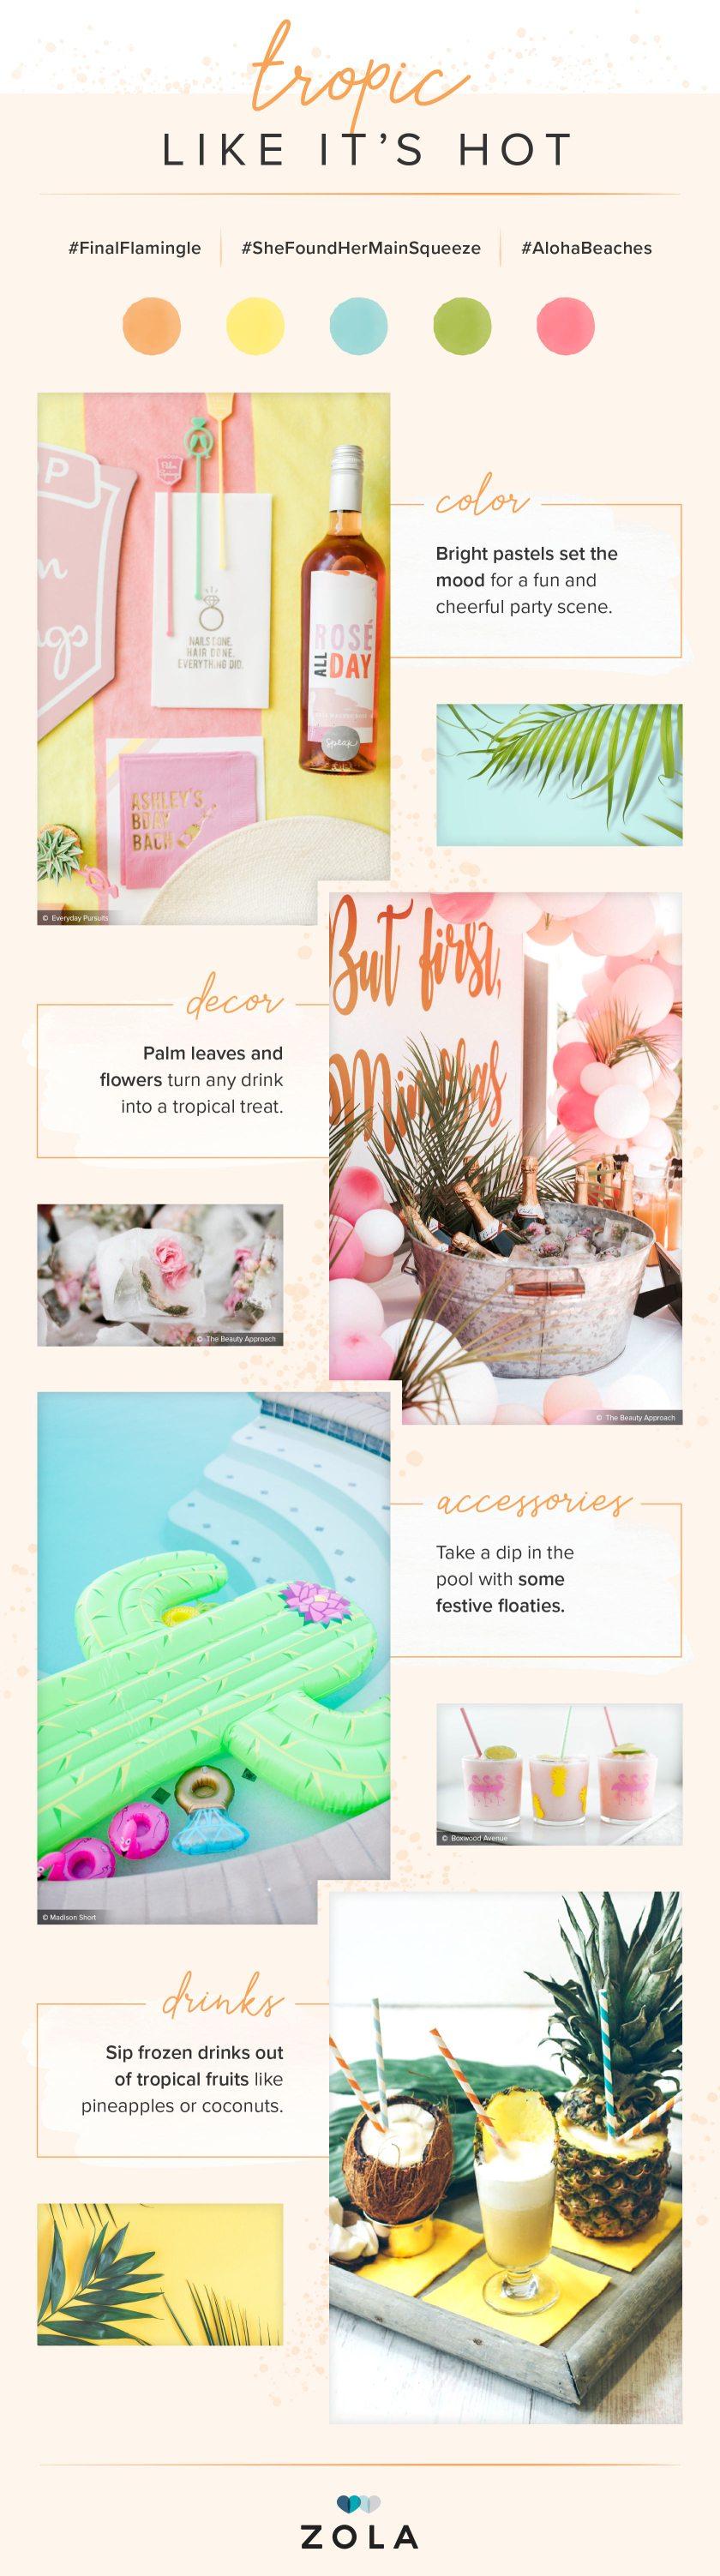 Tropical Bachelorette PartyTheme ideas mood board Tropic Like it's Hot from Zola